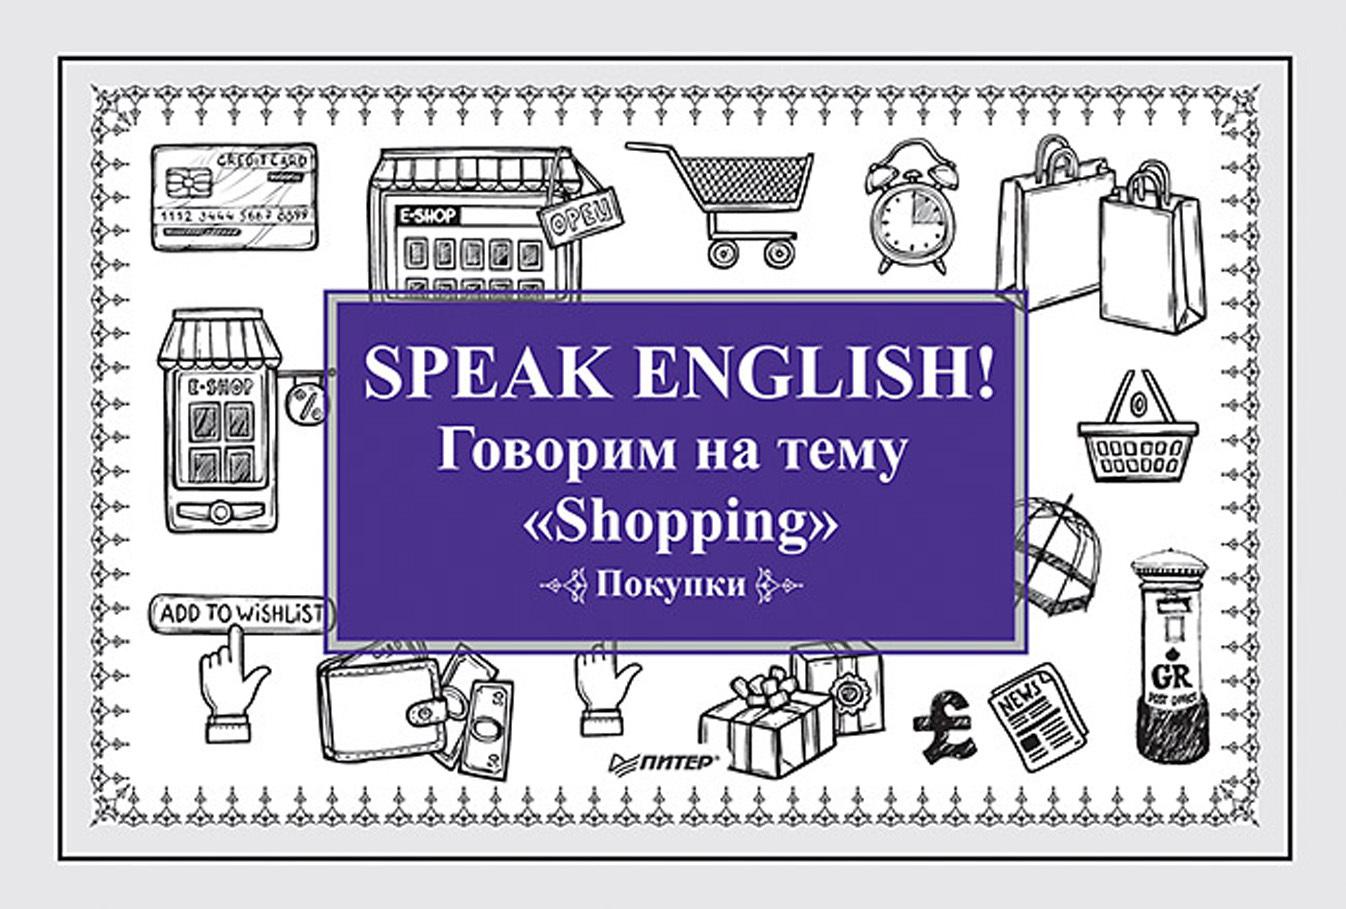 Е. Андронова. Speak English! Говорим на тему «Shopping» (Покупки)